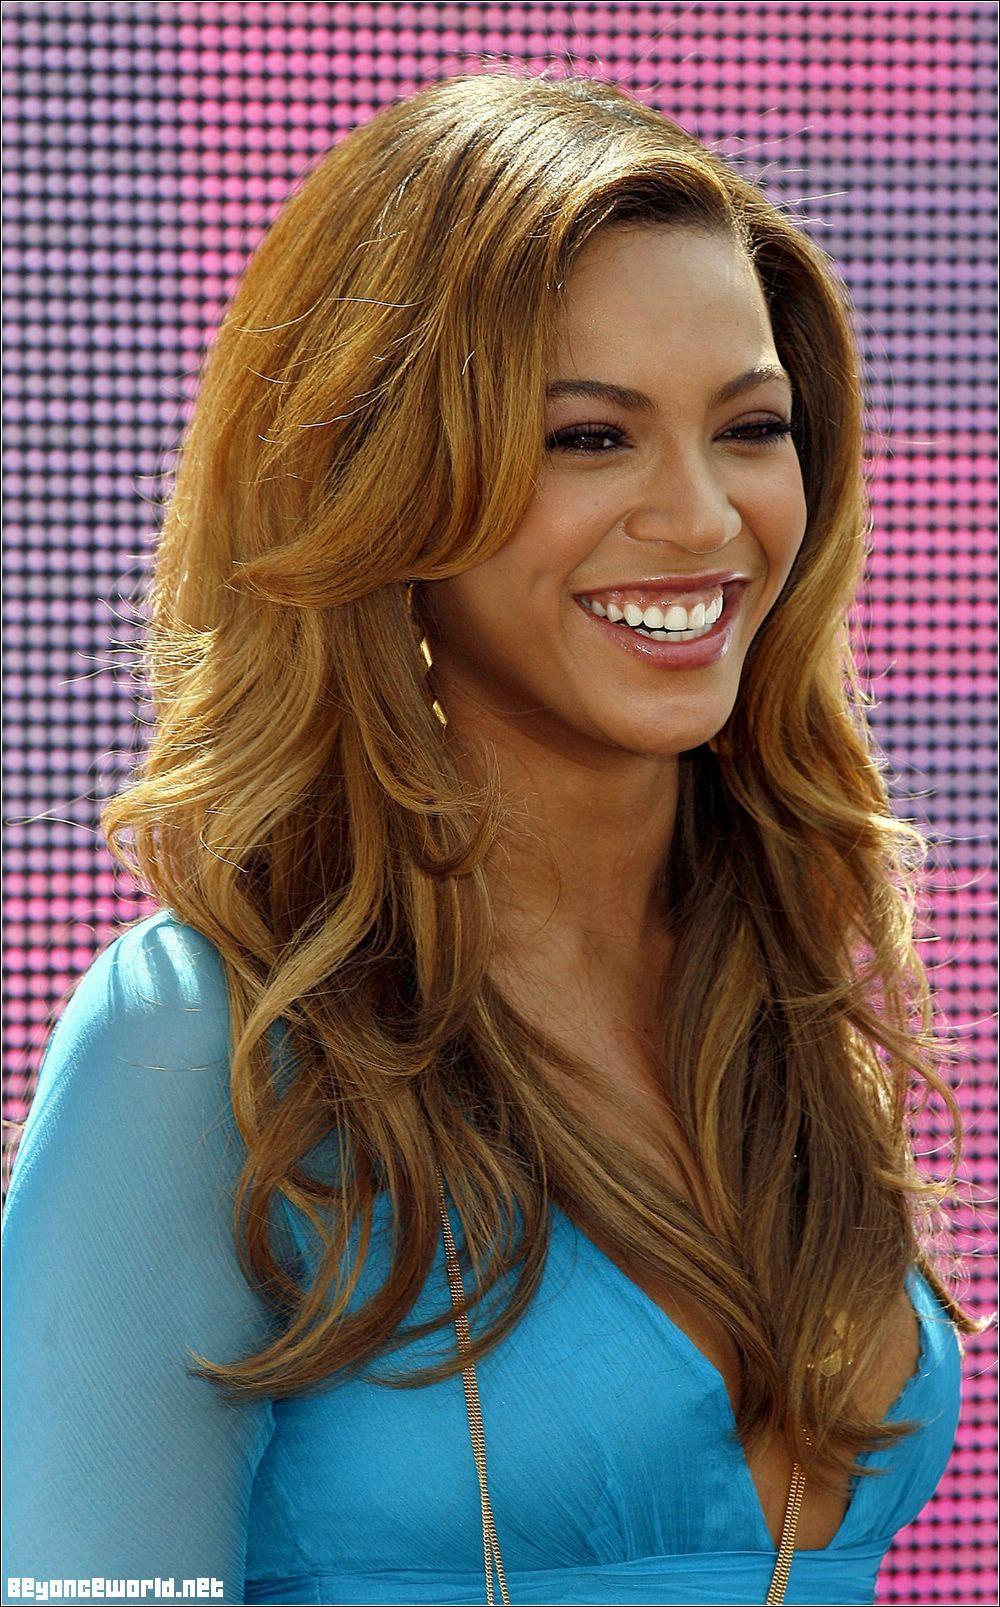 Beyonce Hair Colors Over The Years Hair Pinterest Hair